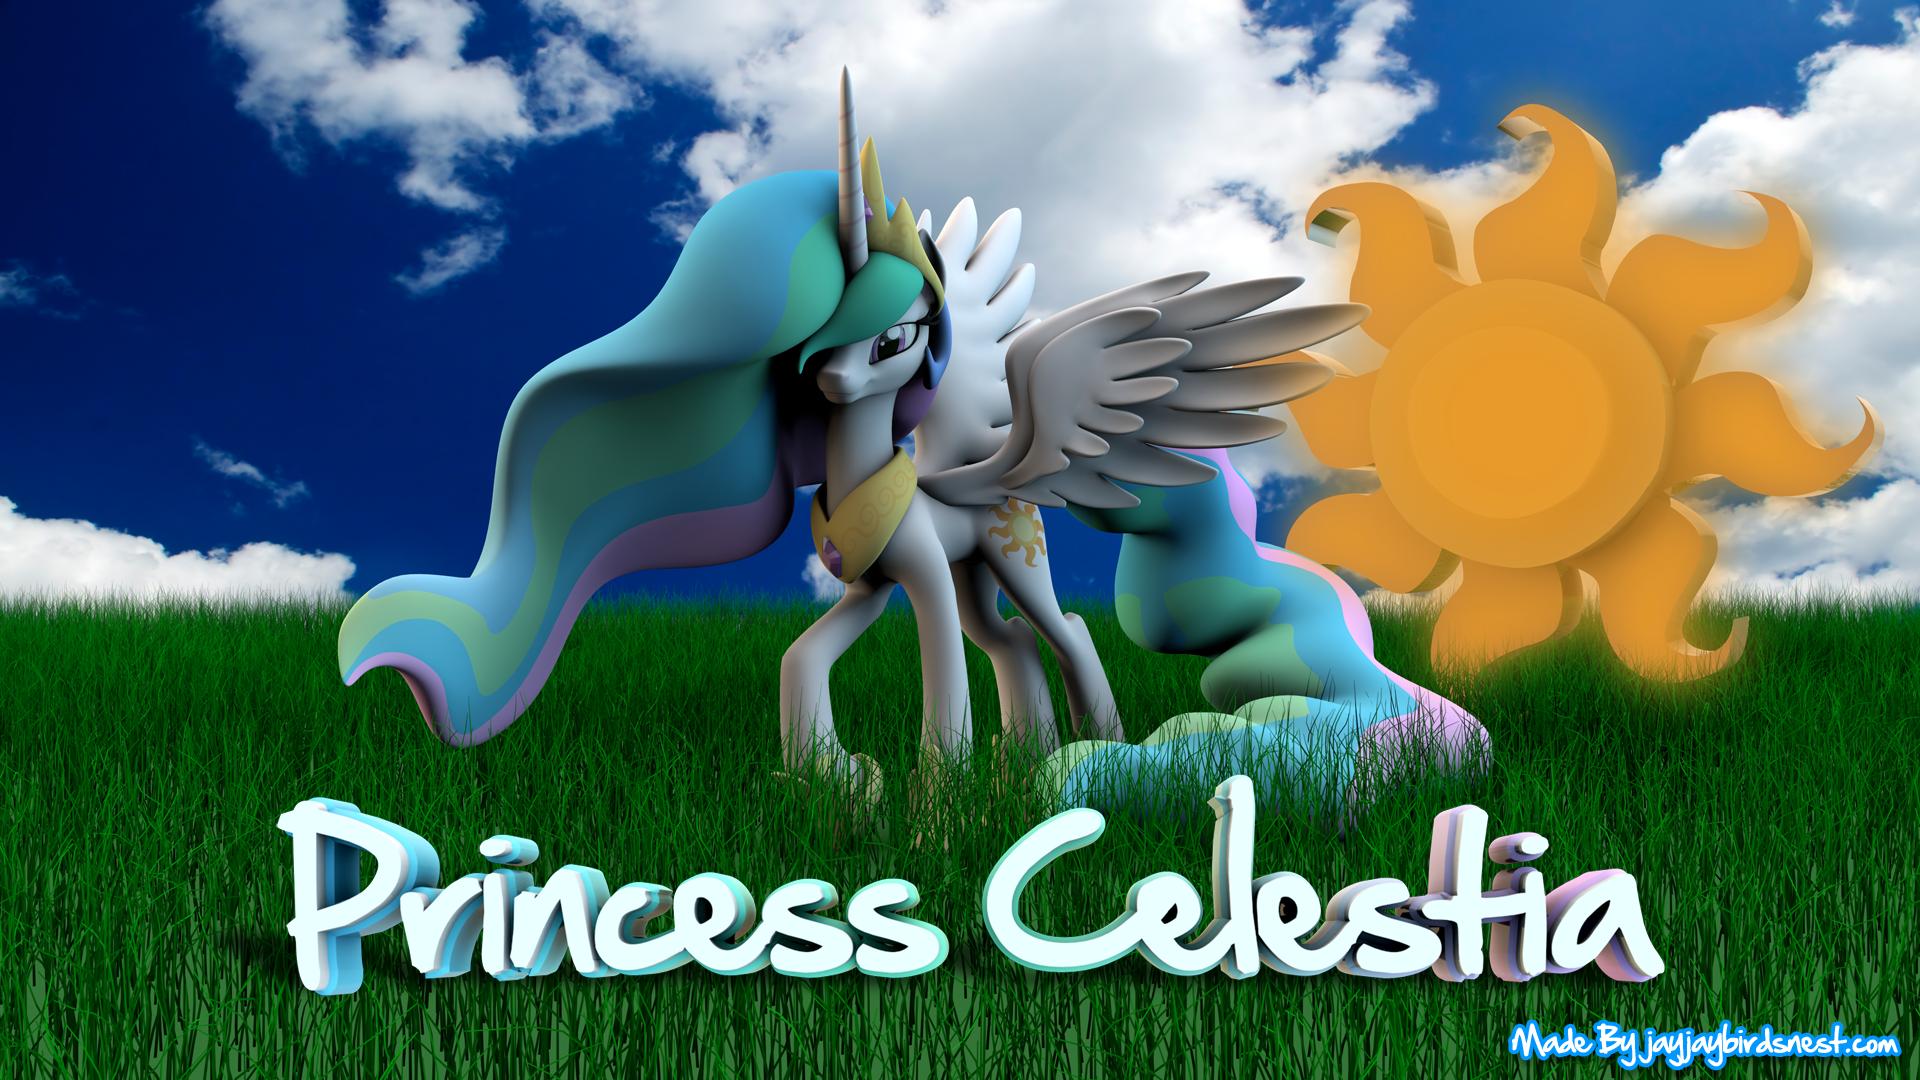 Princess Celestia 3D Wallpaper